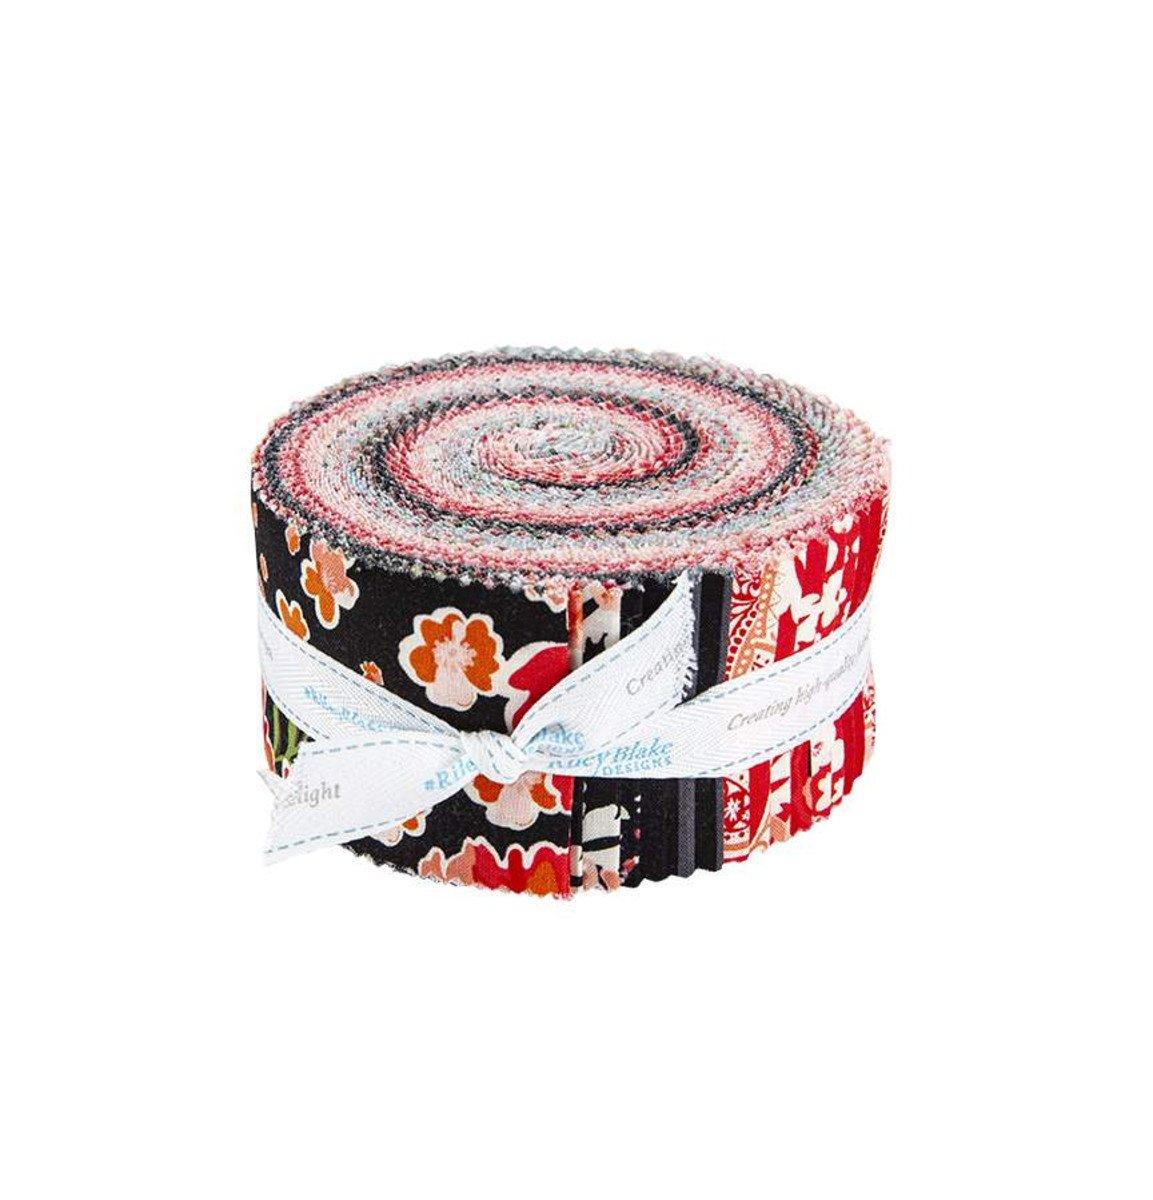 Ava Kate 2-1/2in Strip, 40pcs, 3 bundles/pack